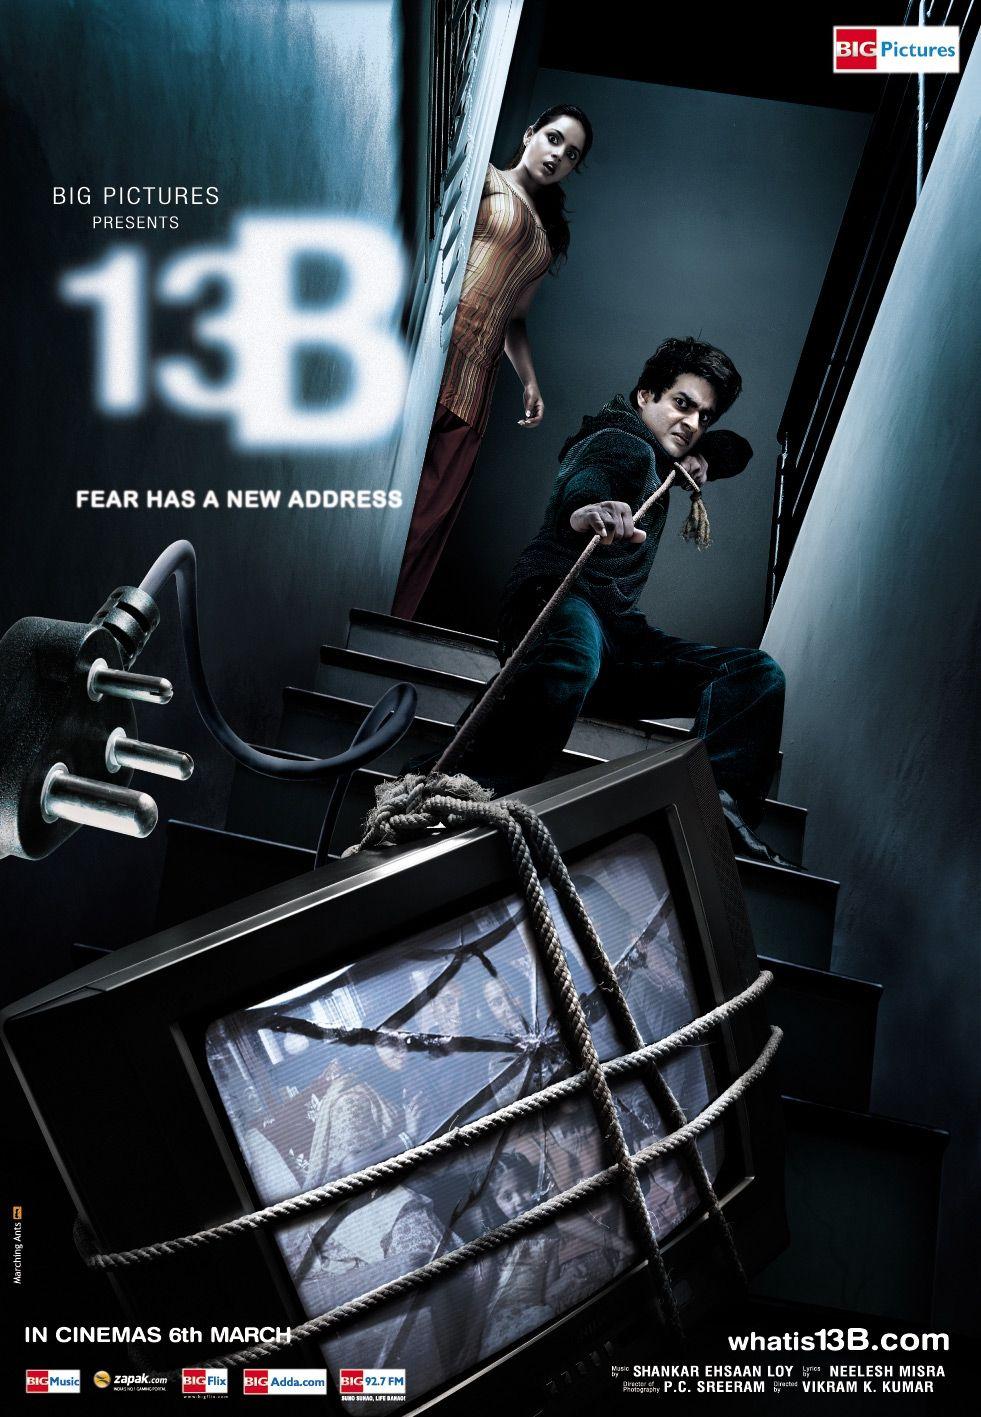 13B Tamil Movie 720p Hd Downloadl - The Offas Dyke Collaboratory